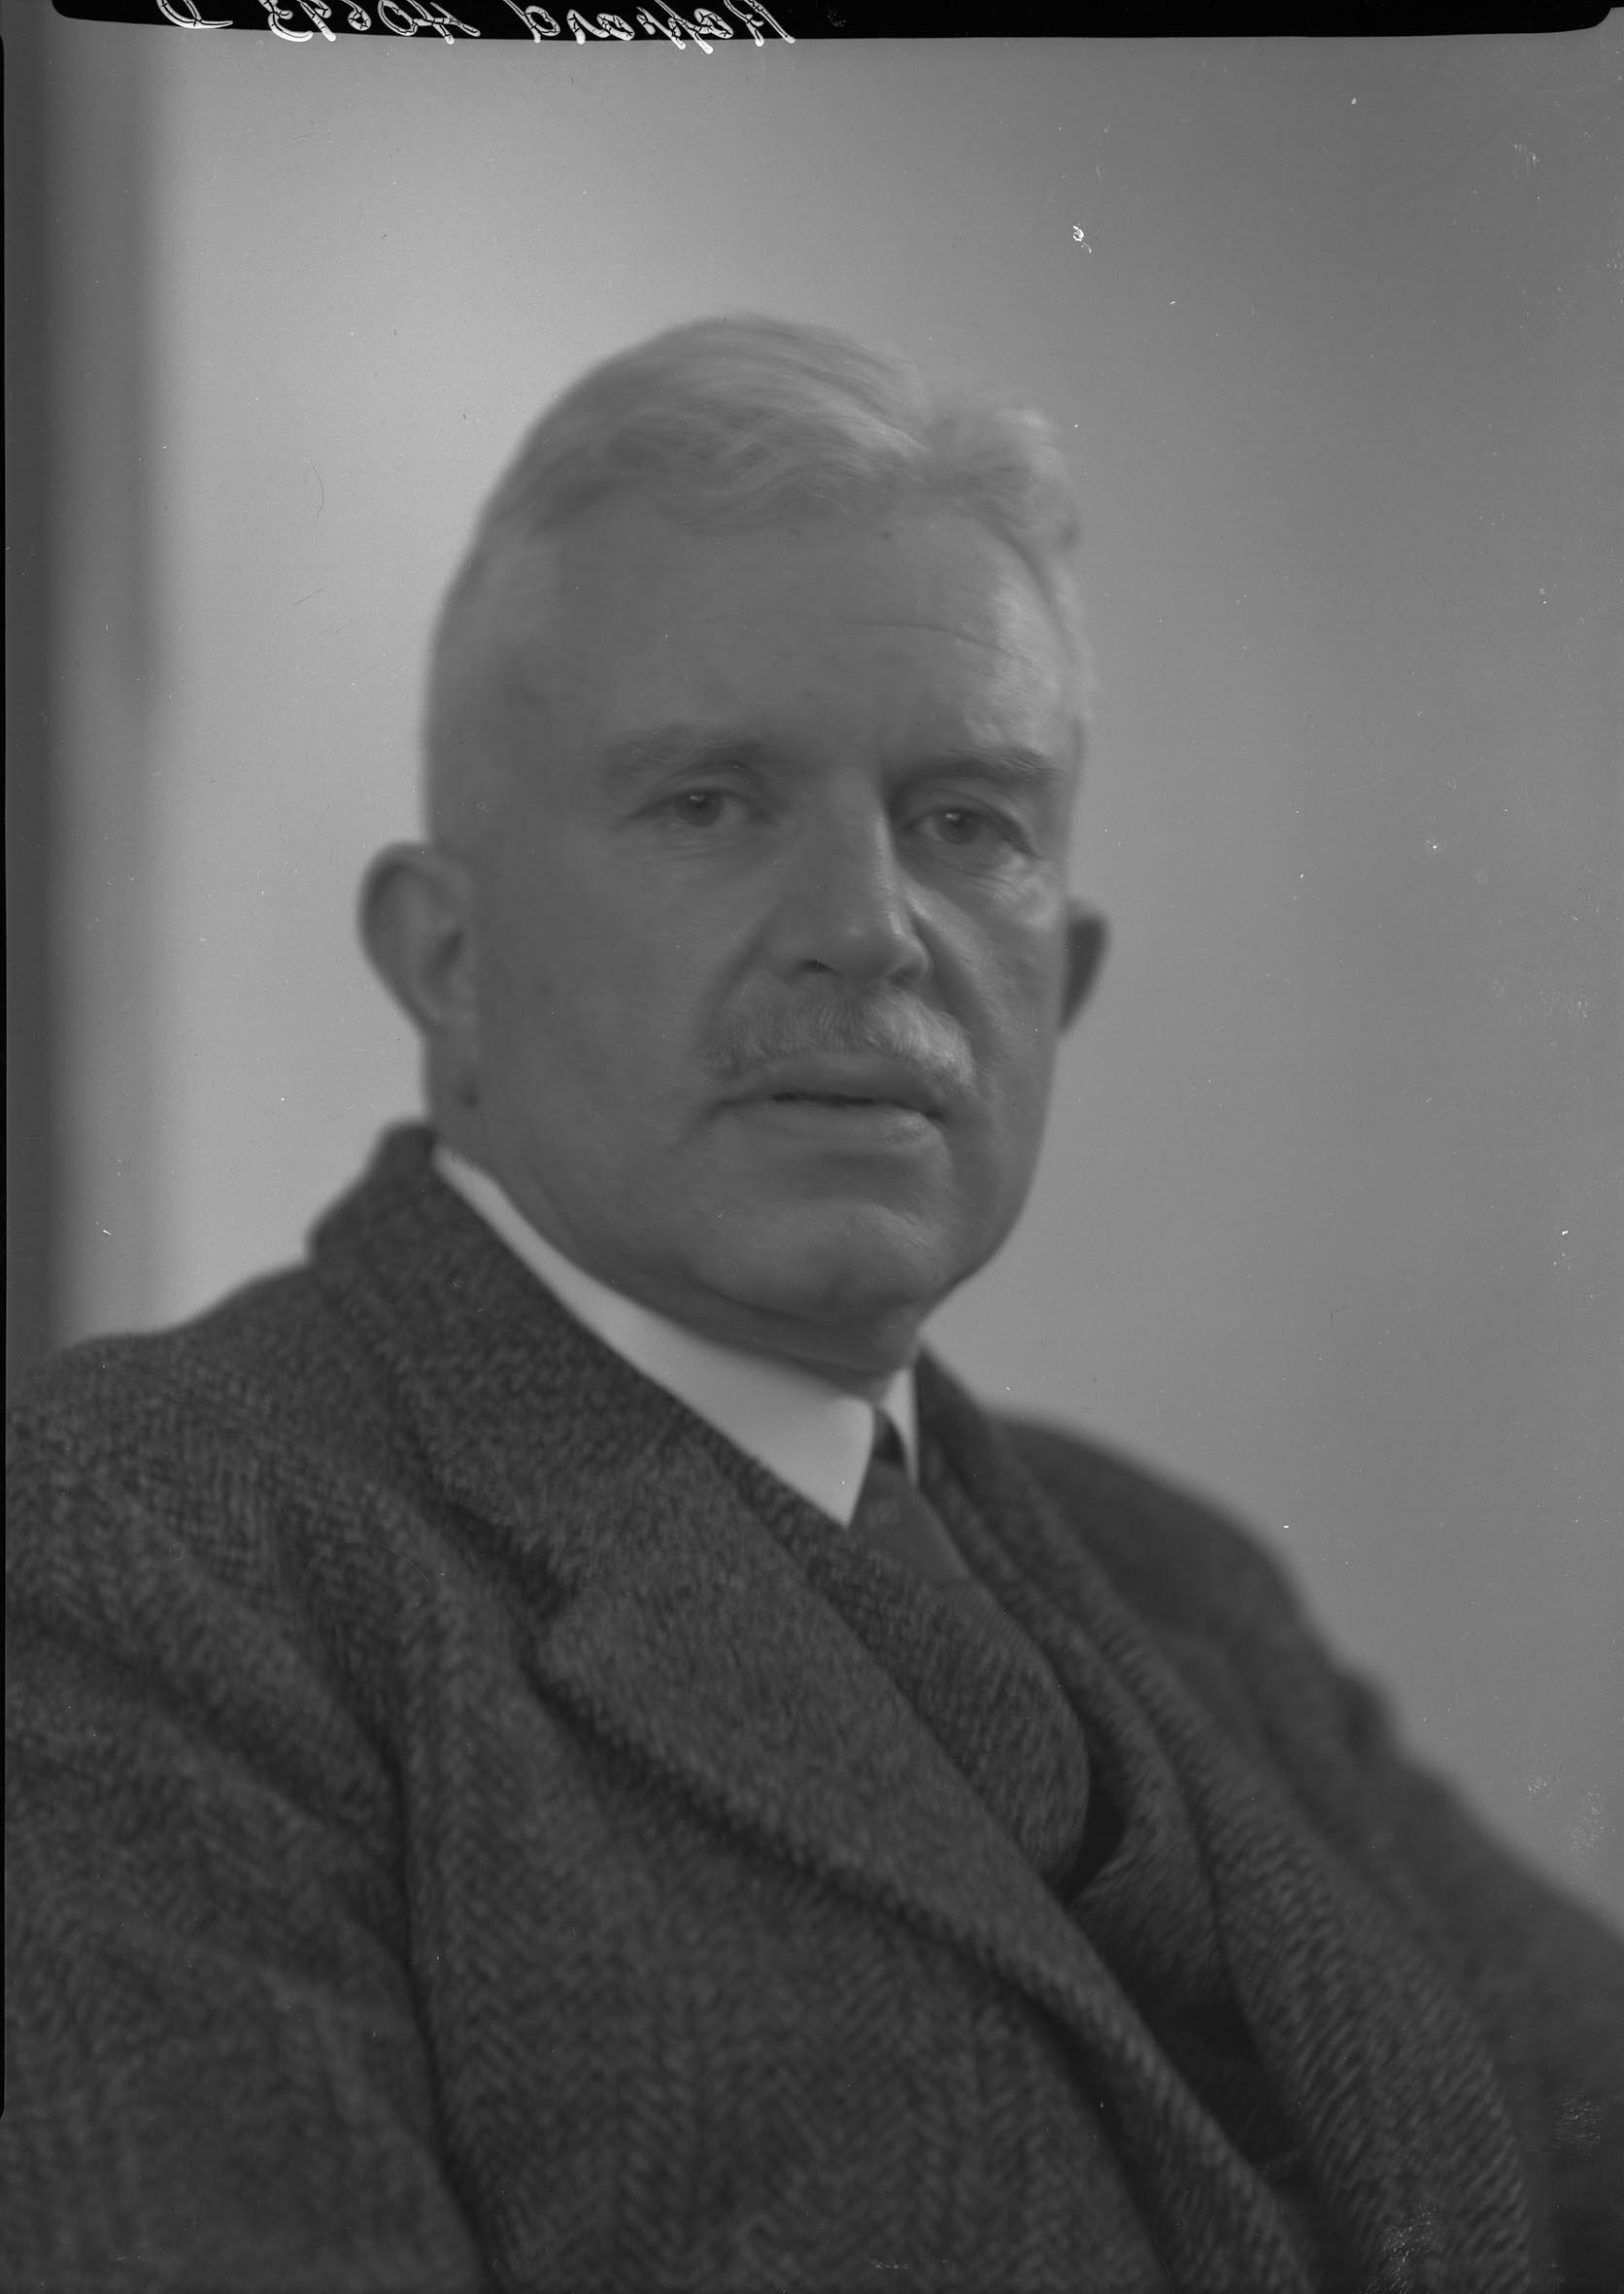 Portrait de William Rappard